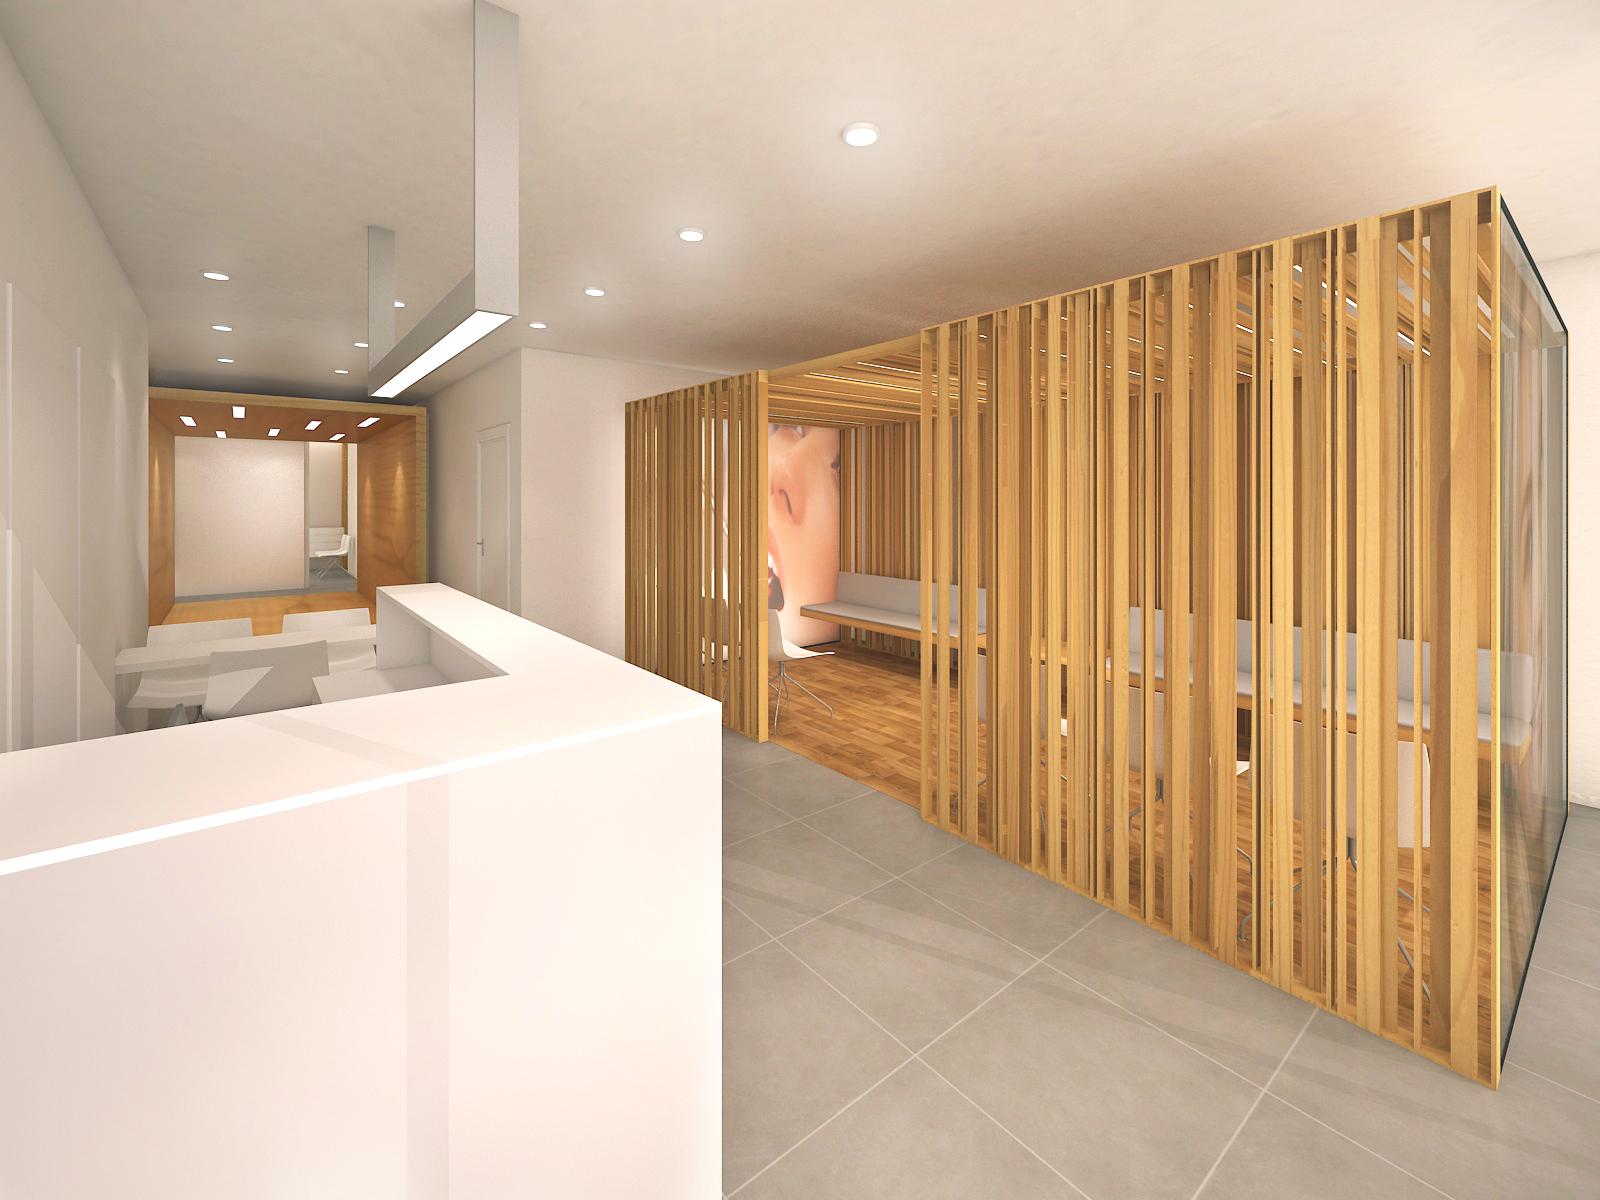 interior design dental clinic br santacreu design